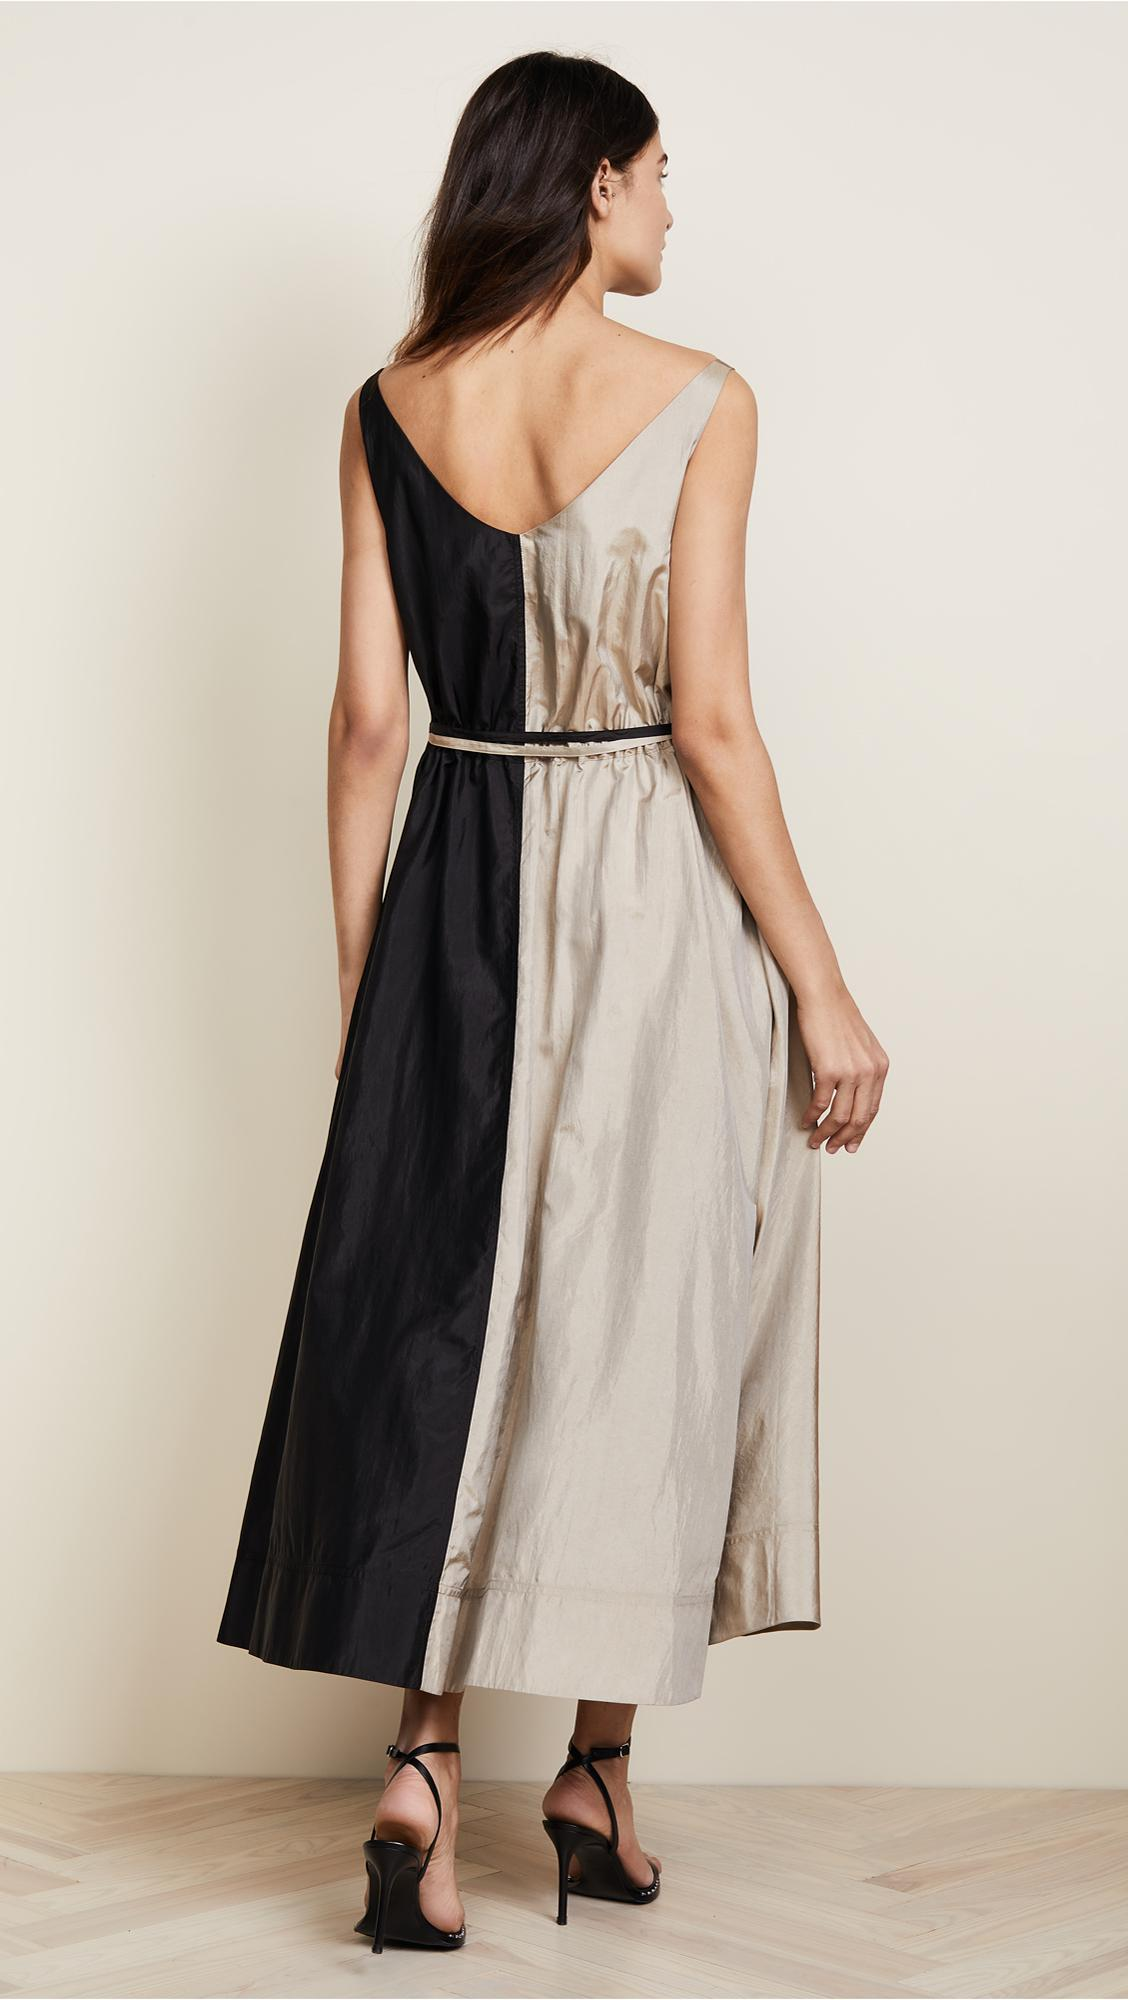 Nina Ricci Synthetic Parachute Dress In Black Lyst